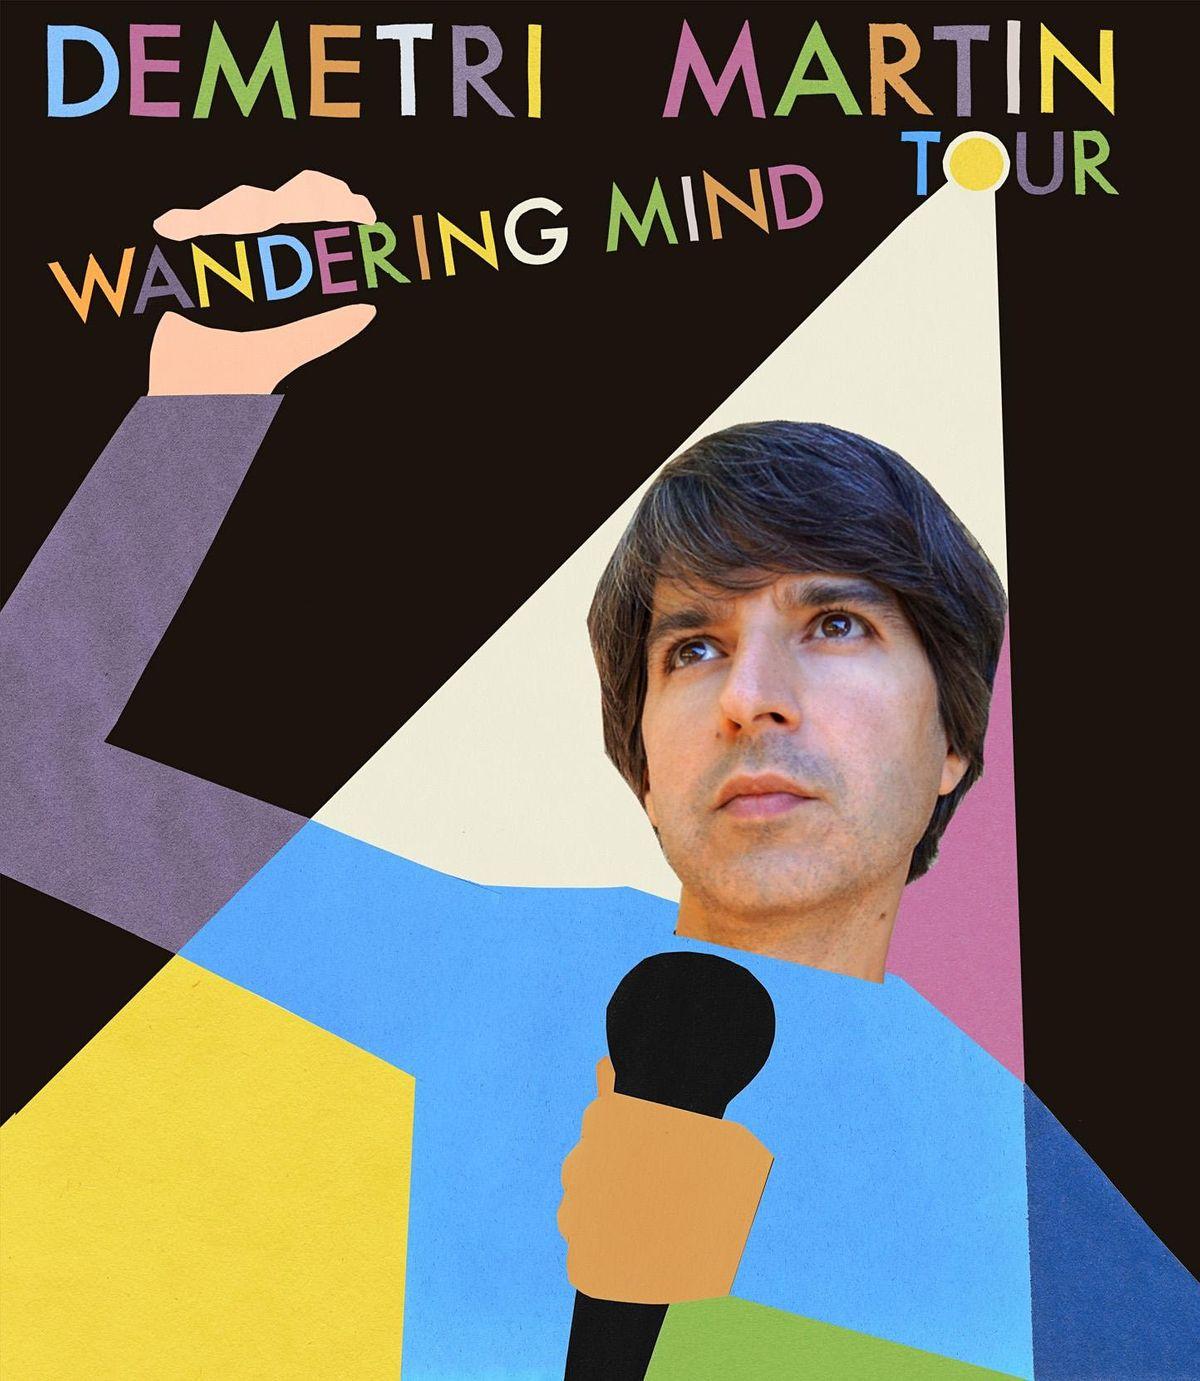 Demetri Martin Wandering Mind Tour